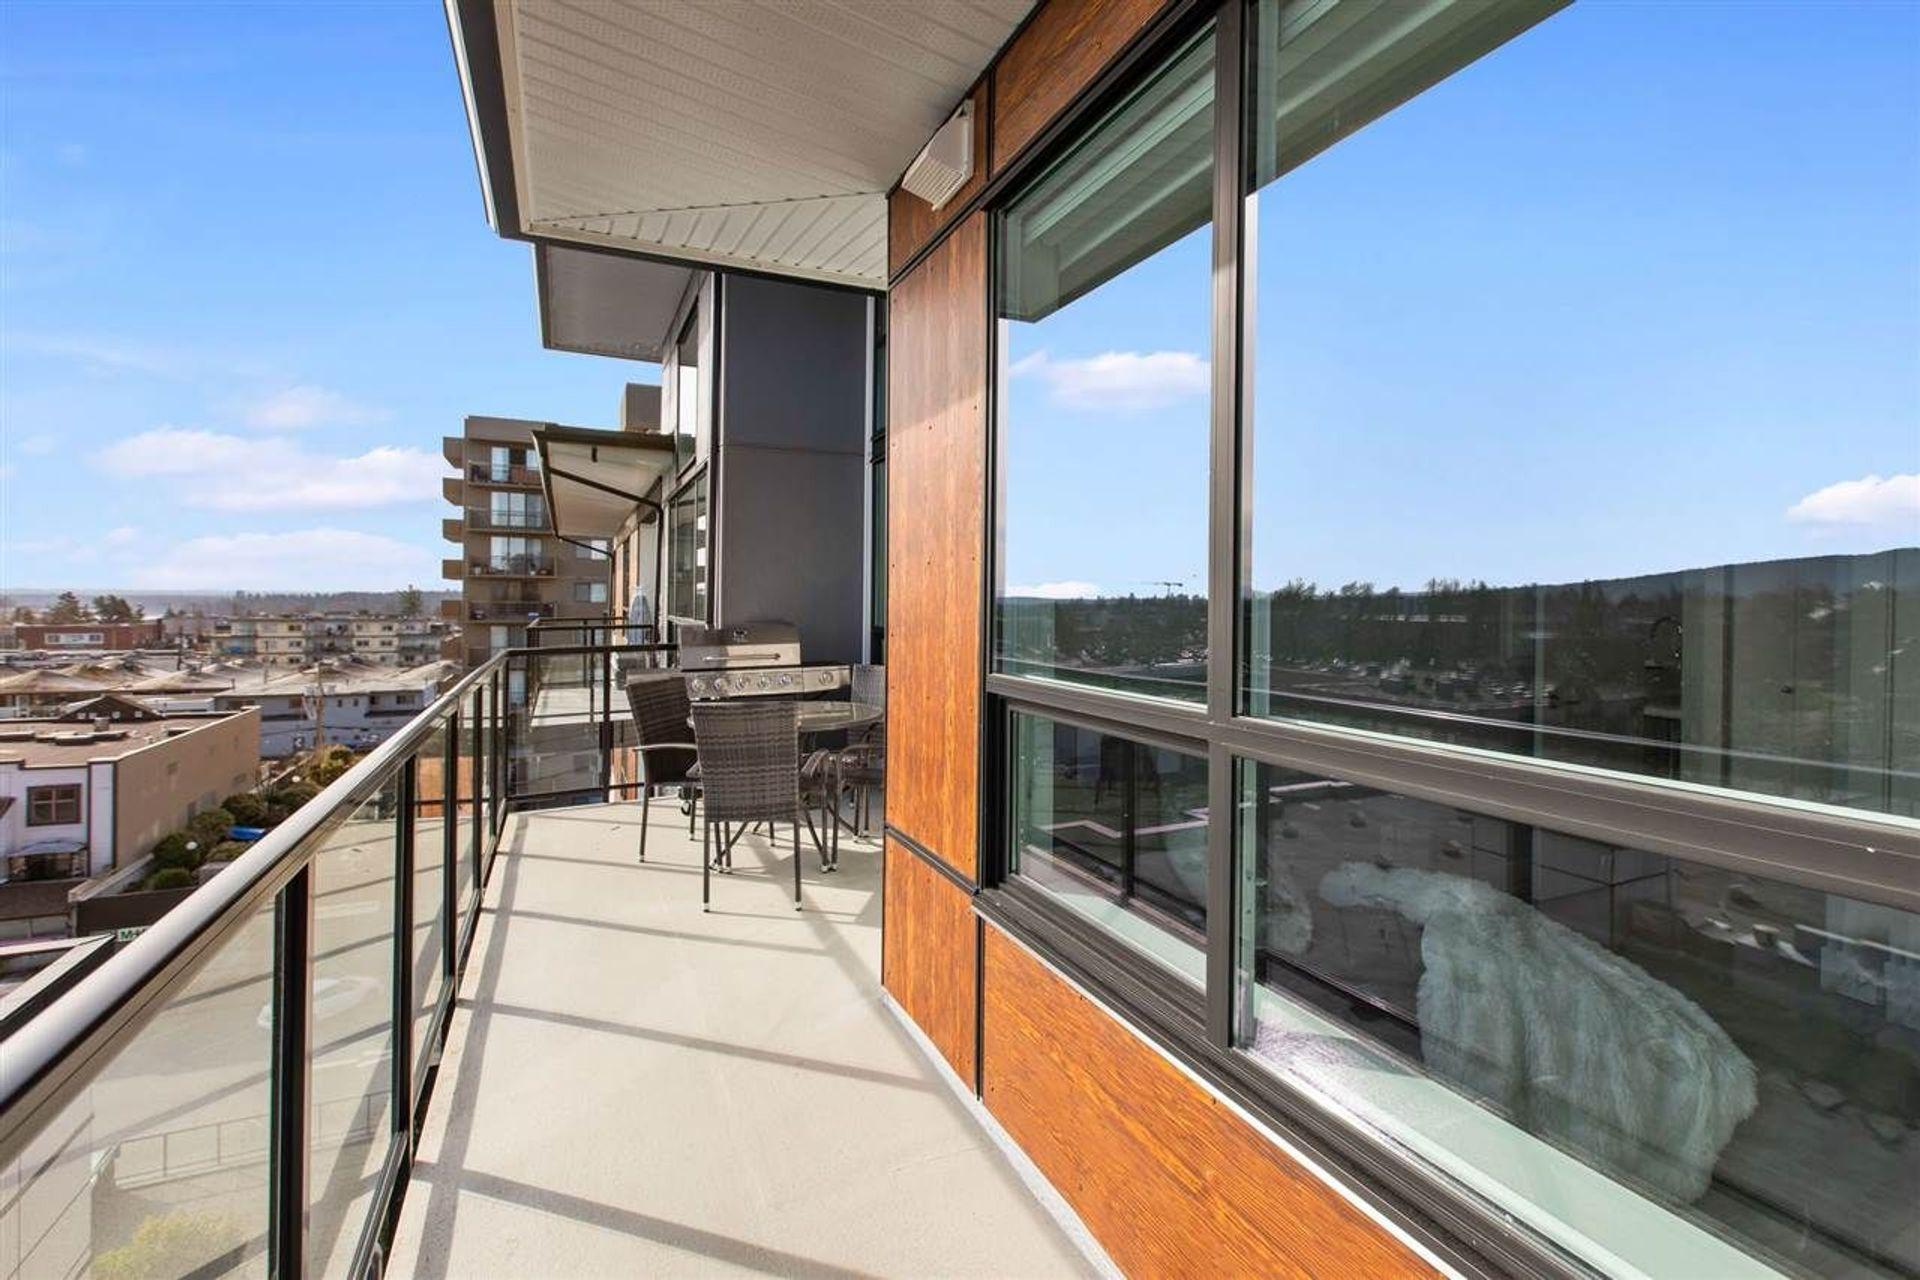 22335-mcintosh-avenue-east-central-maple-ridge-25 of 603 - 22335 Mcintosh Avenue, East Central, Maple Ridge